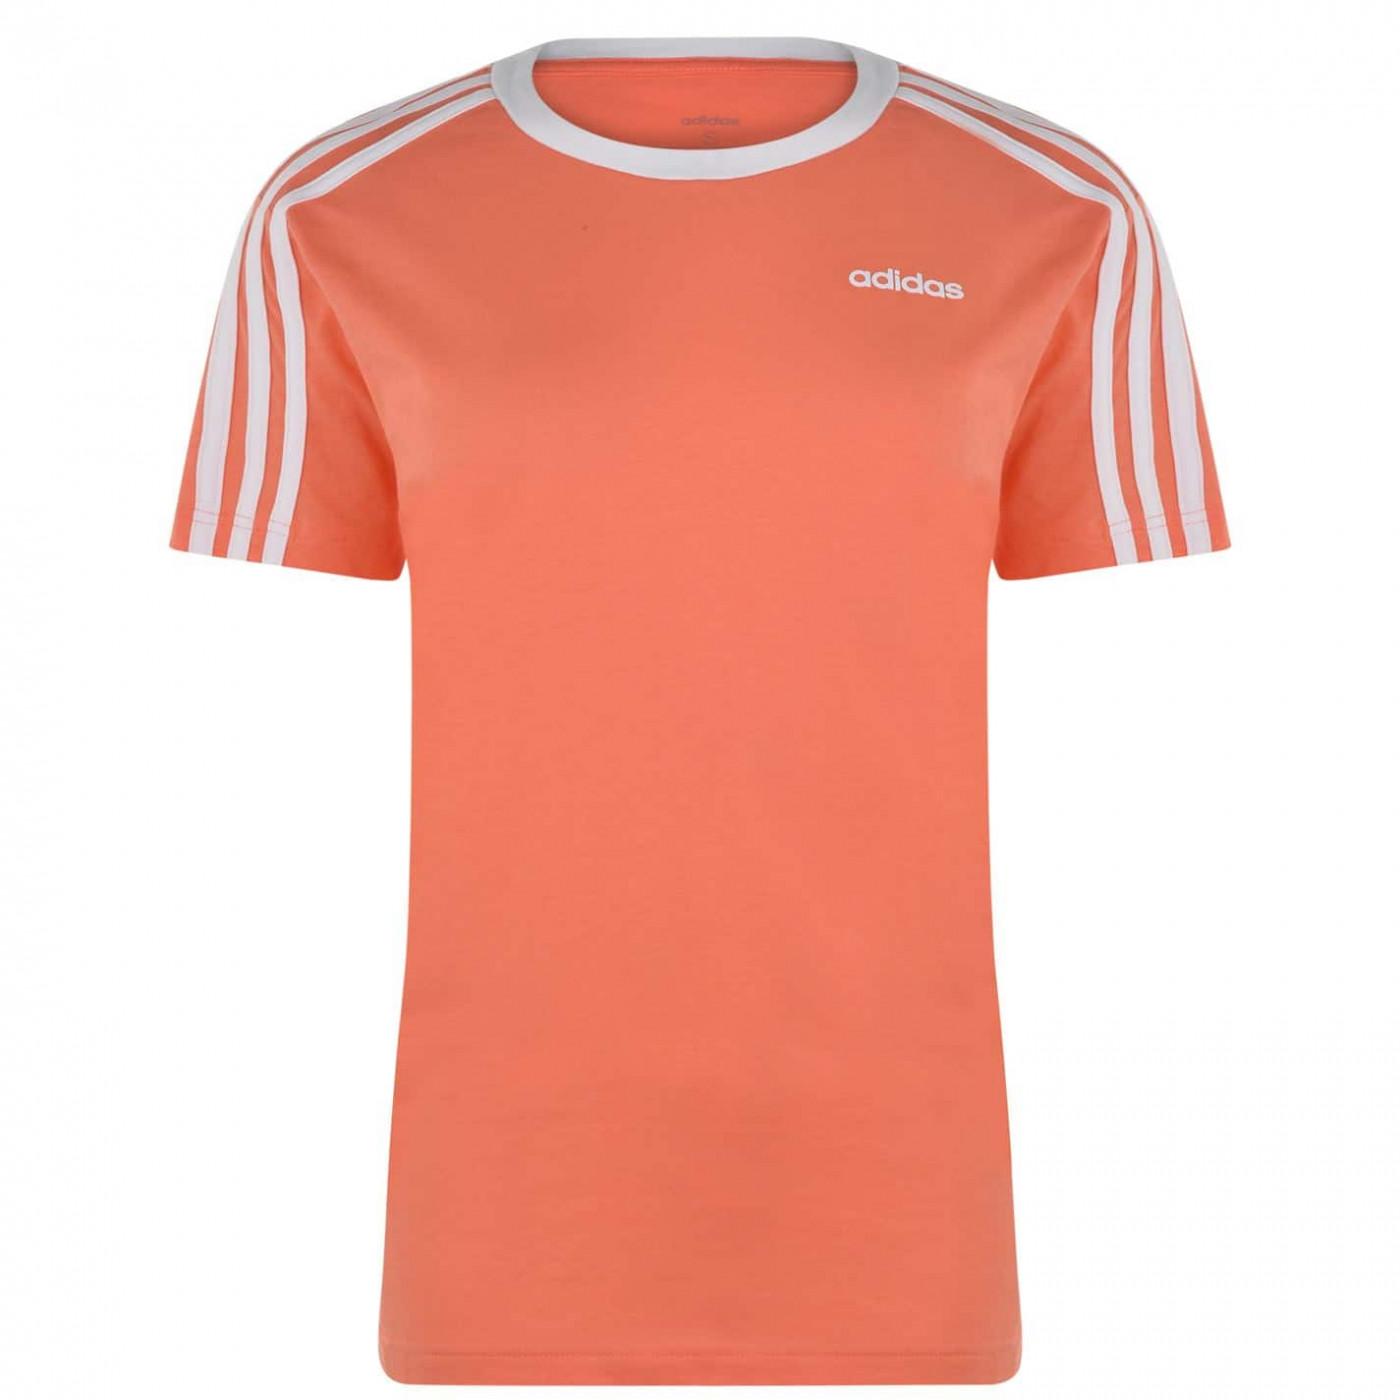 Adidas Essentials 3 Stripe T Shirt Ladies